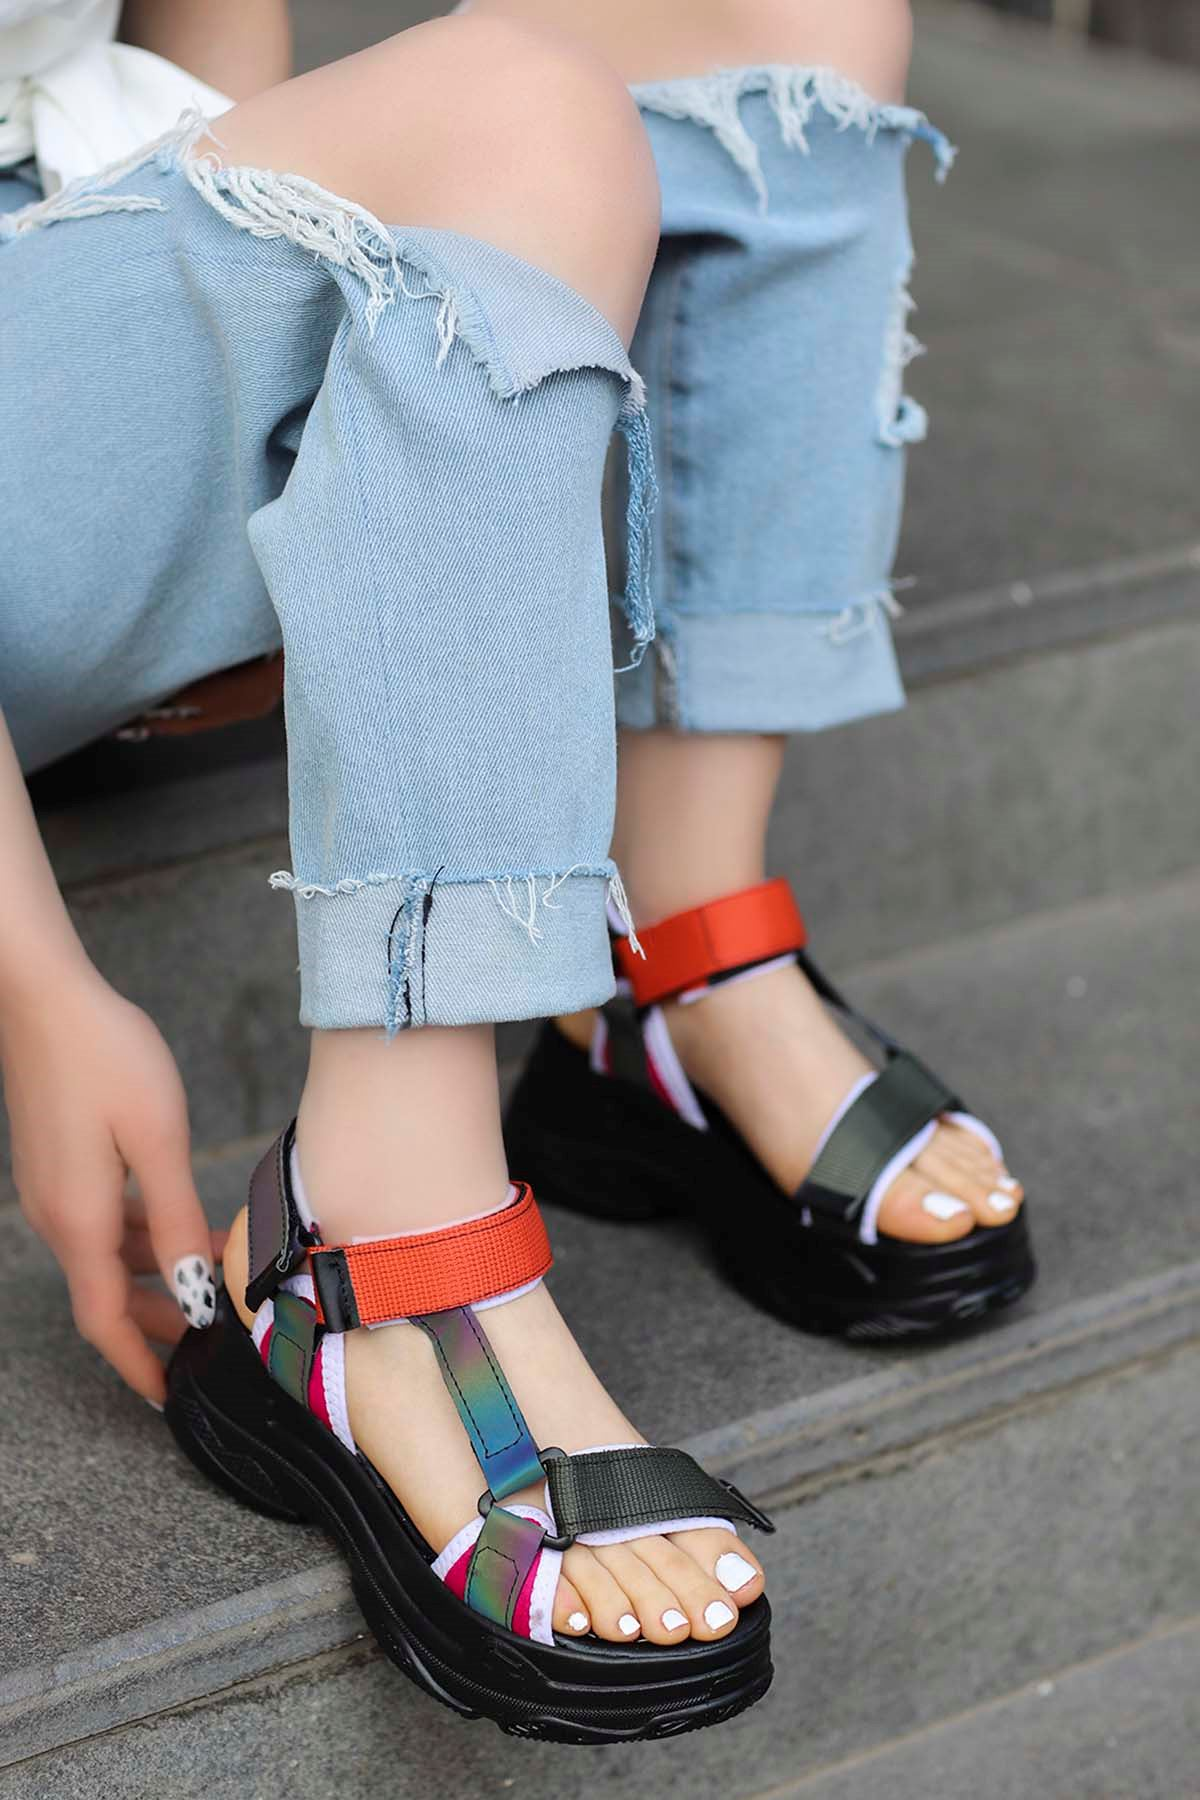 Rafael Dolgu Taban Sandalet Siyah/Turucu